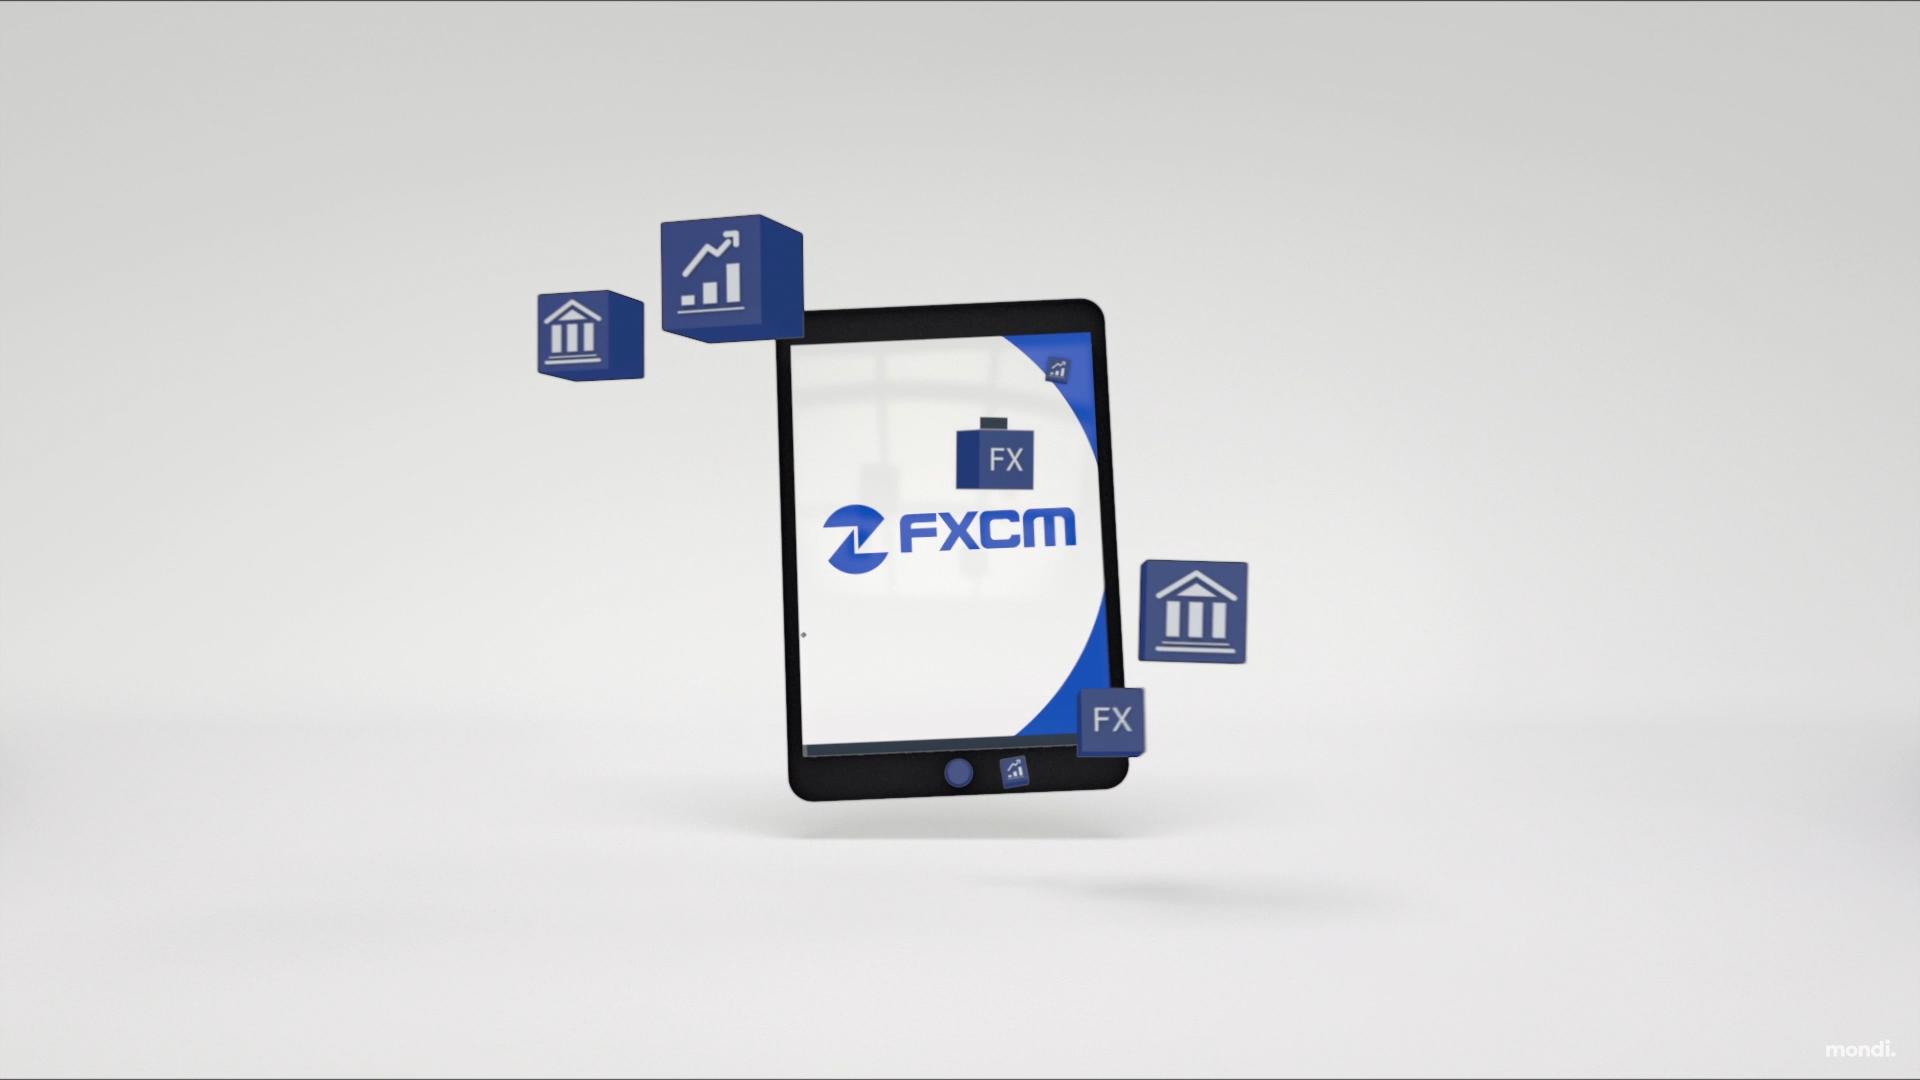 Fxcm spread betting online soccer betting in uganda kampala